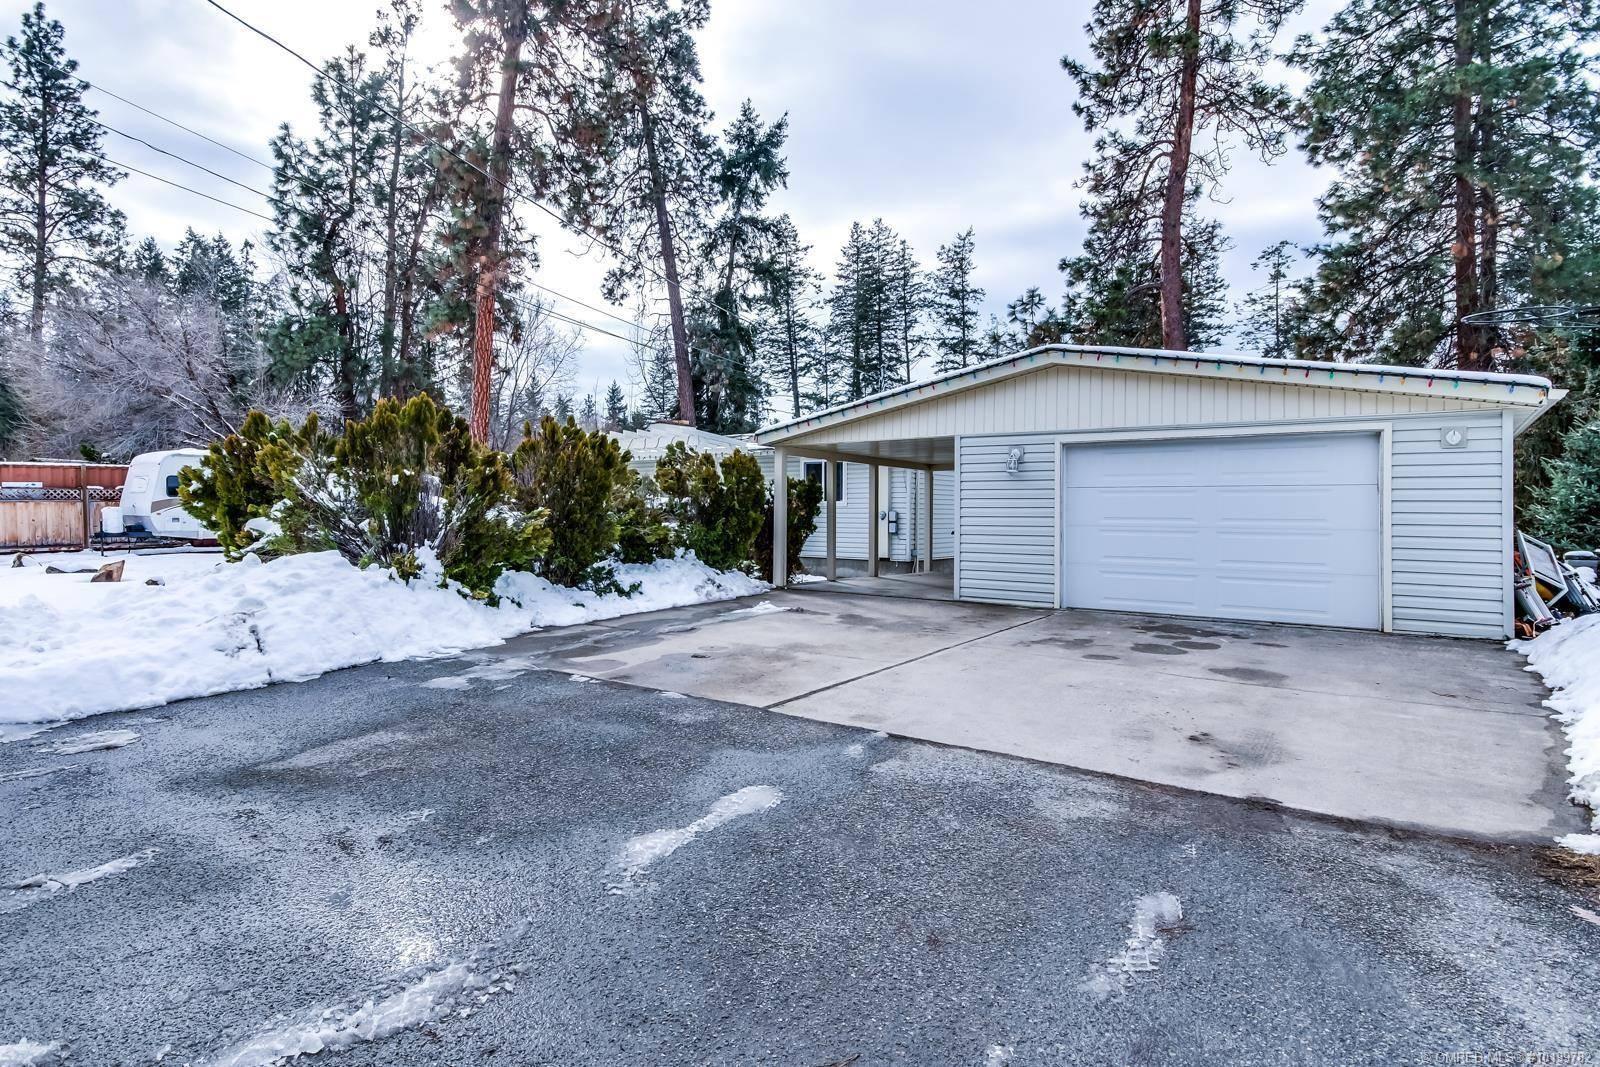 House for sale at 2570 Maquinna Rd Kelowna British Columbia - MLS: 10199782